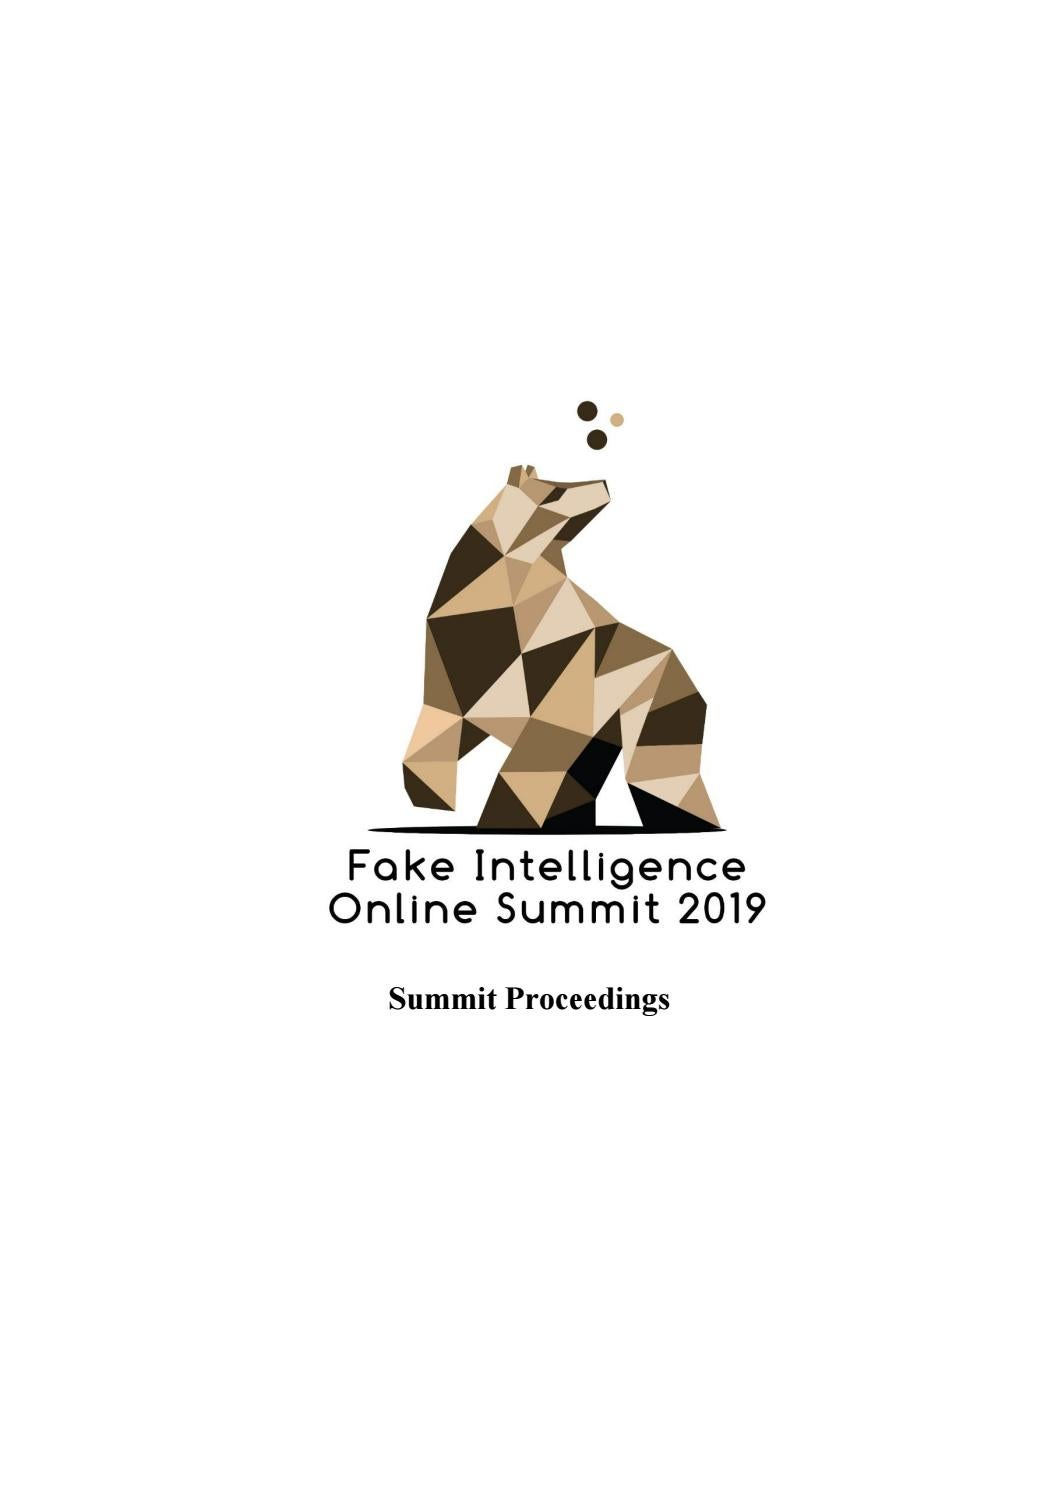 Proceedings of Fake Intelligence Online Summit 2019 by SAMK